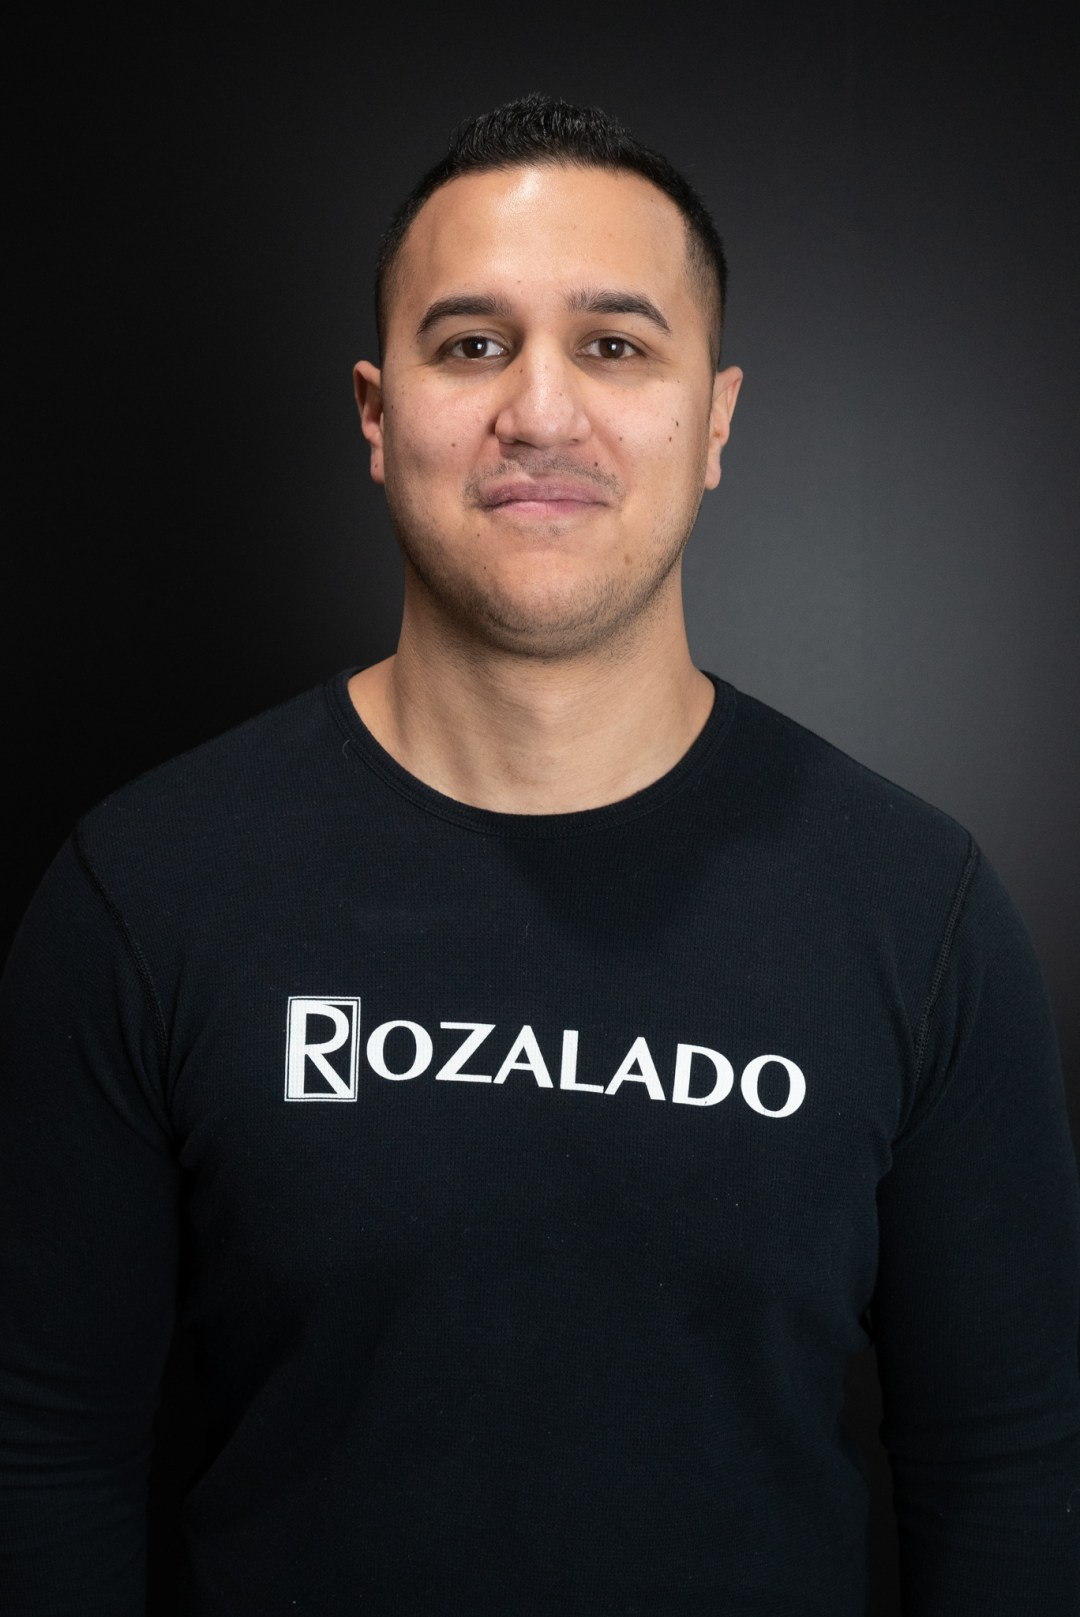 Alex Regalado